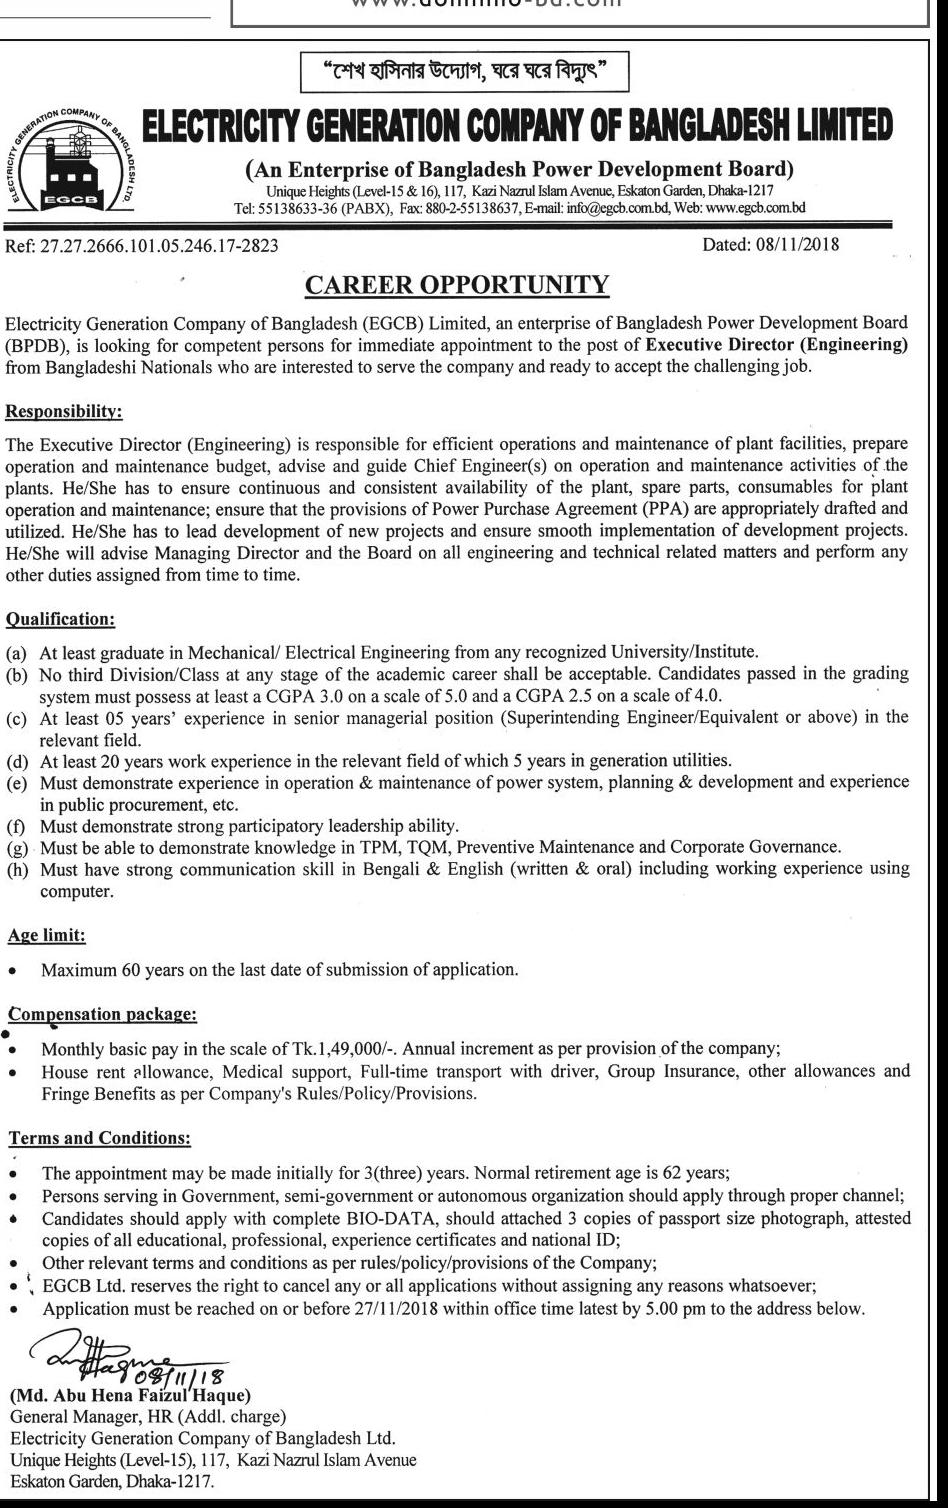 EGCB Job Circular in November 2018